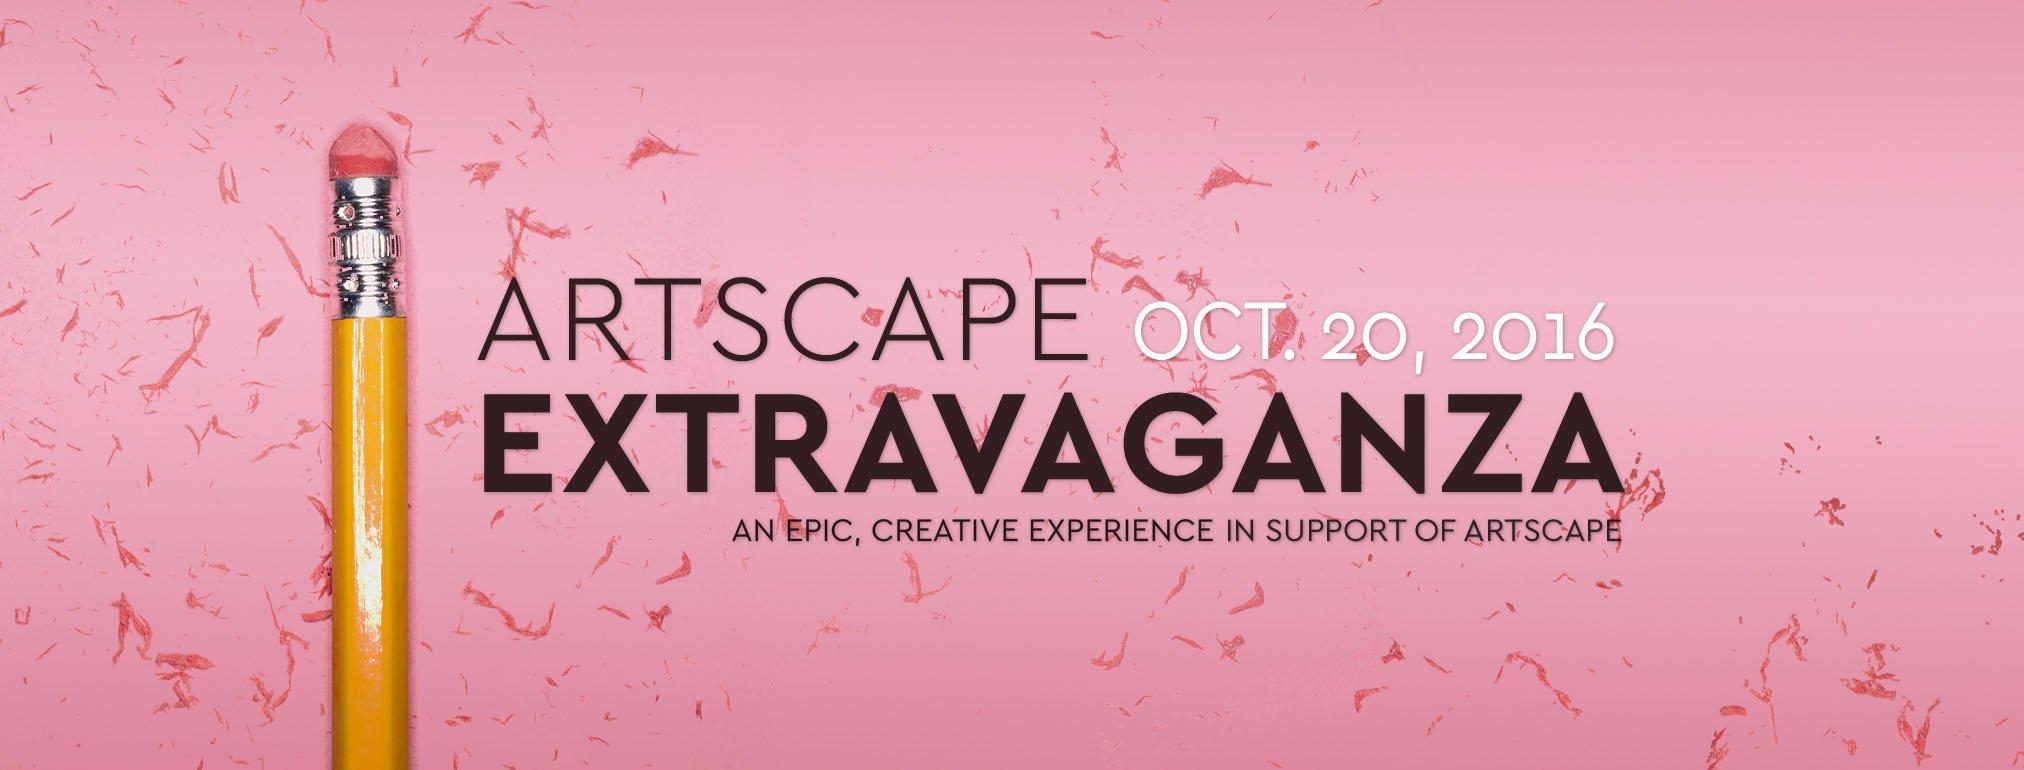 Artscape Extravaganza In Support Of Artscape